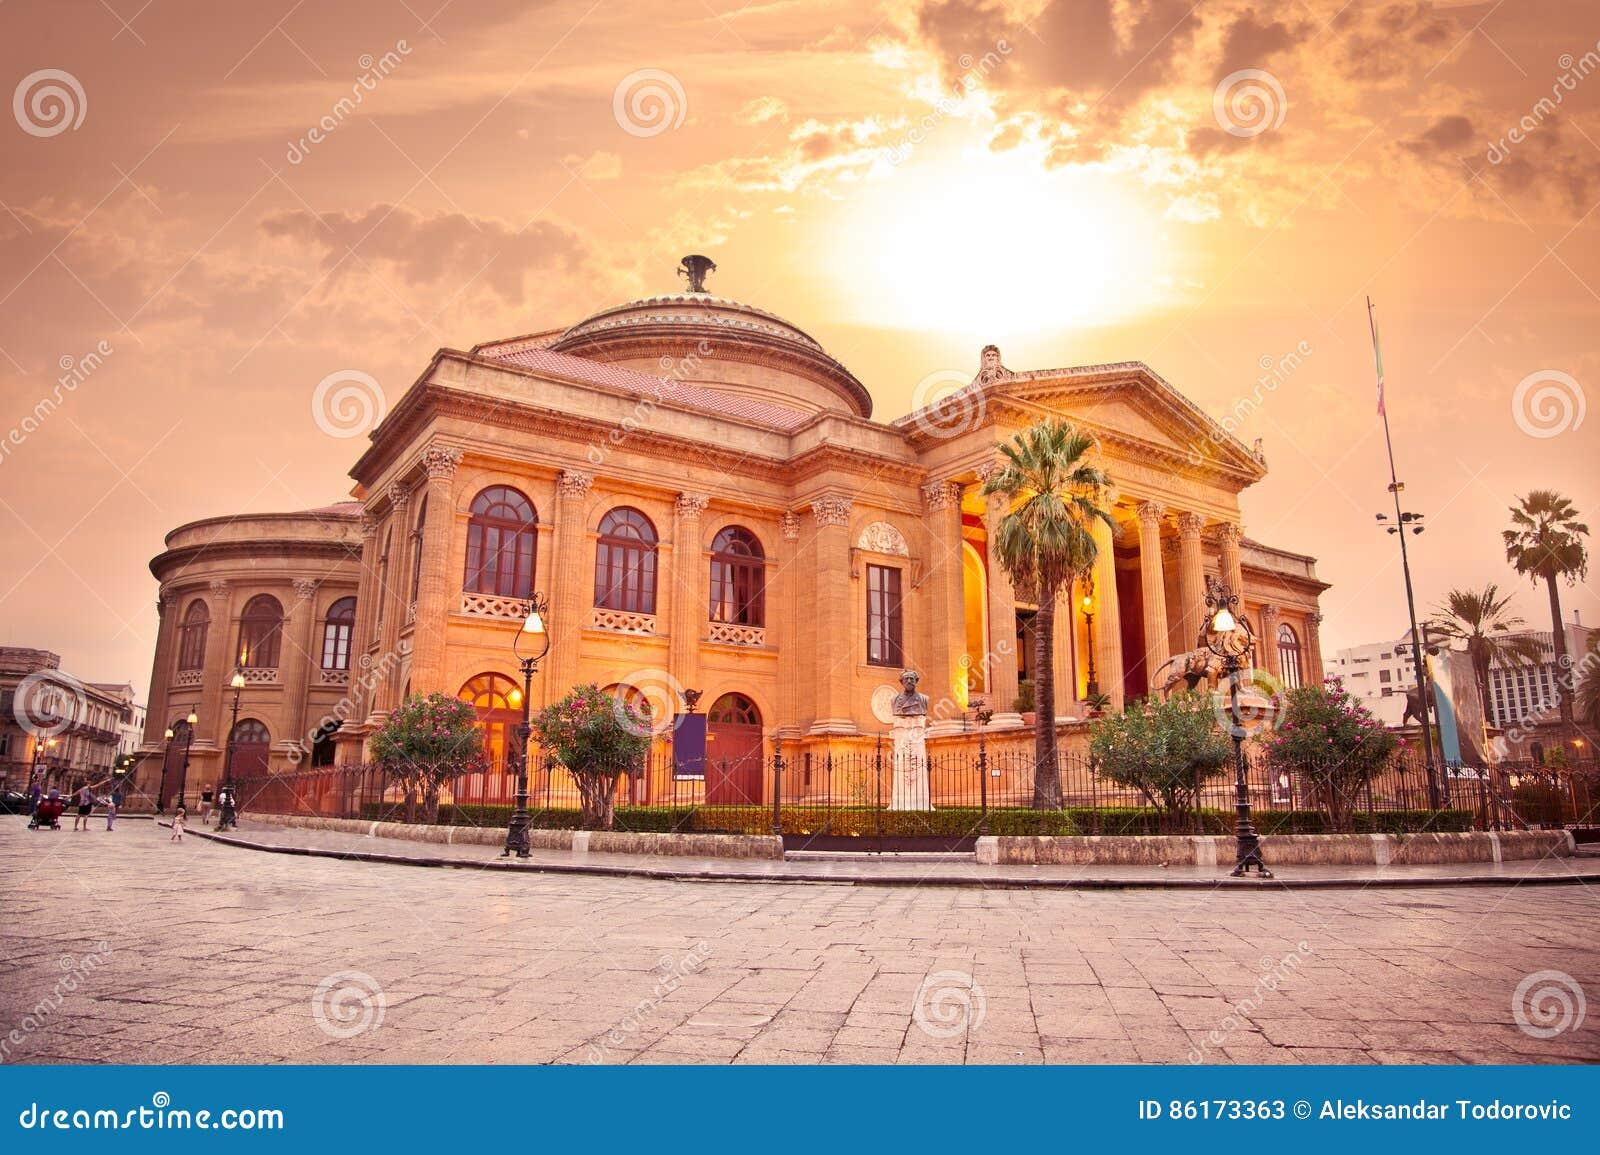 Teatro Massimo, Opera House In Palermo. Sicily. Stock Image - Image ...